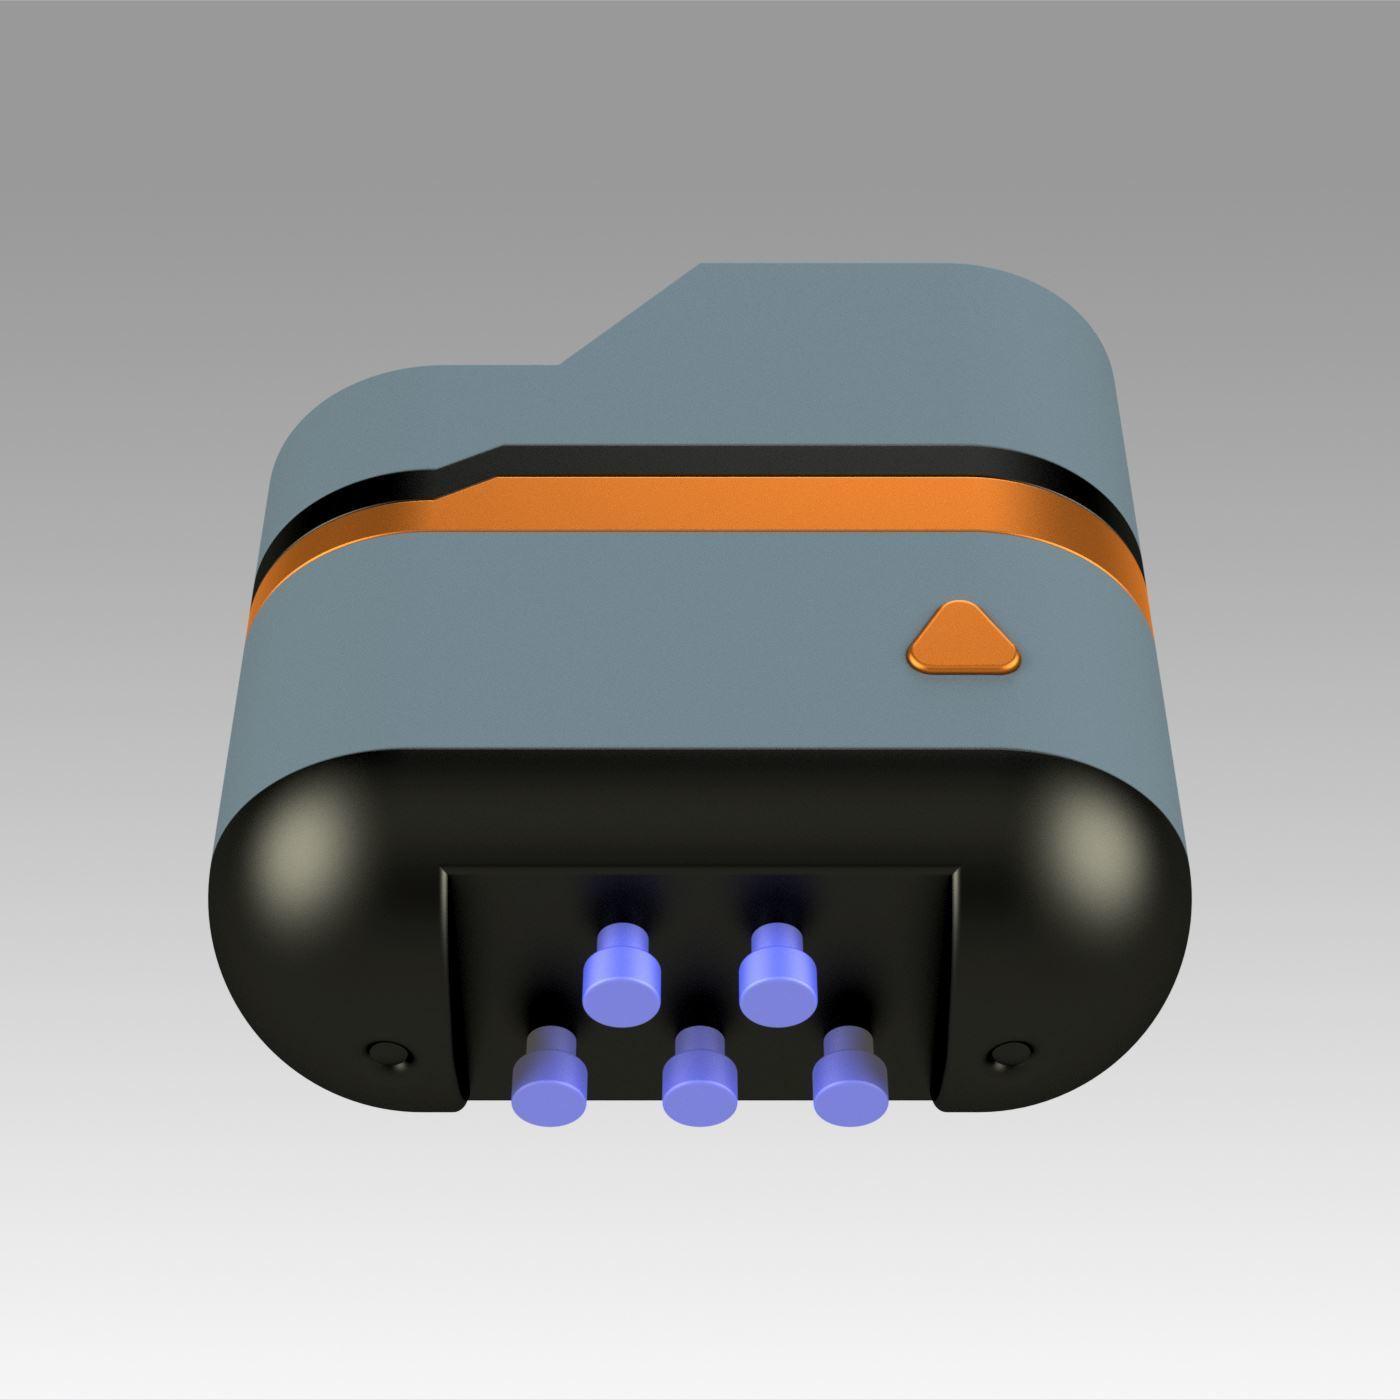 5.jpg Download OBJ file Star Trek Prop Dr Phlox Scanner replica prop cosplay • 3D printer object, Blackeveryday